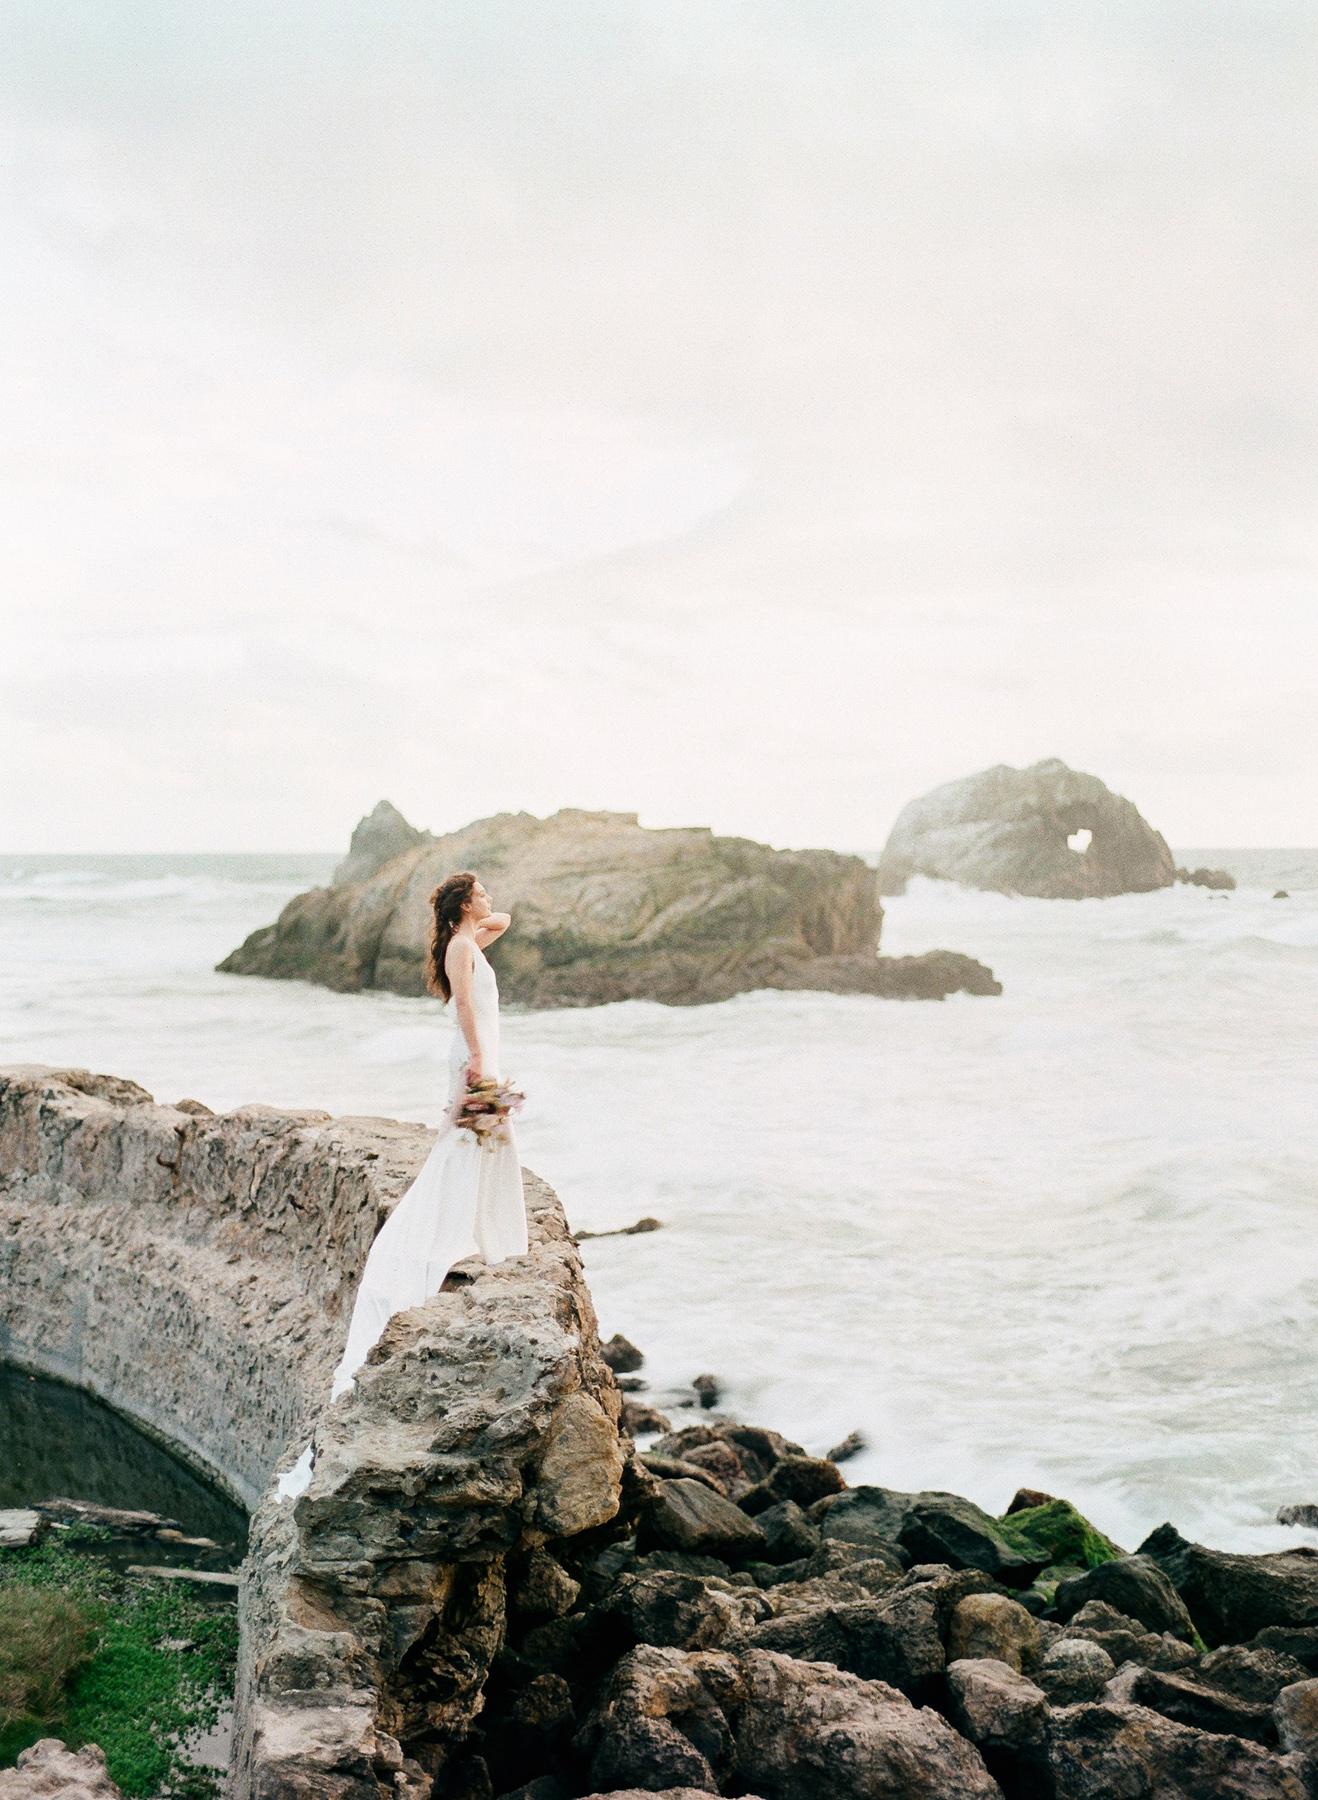 San-Francisco-Wedding-Film-Photography-30.jpg